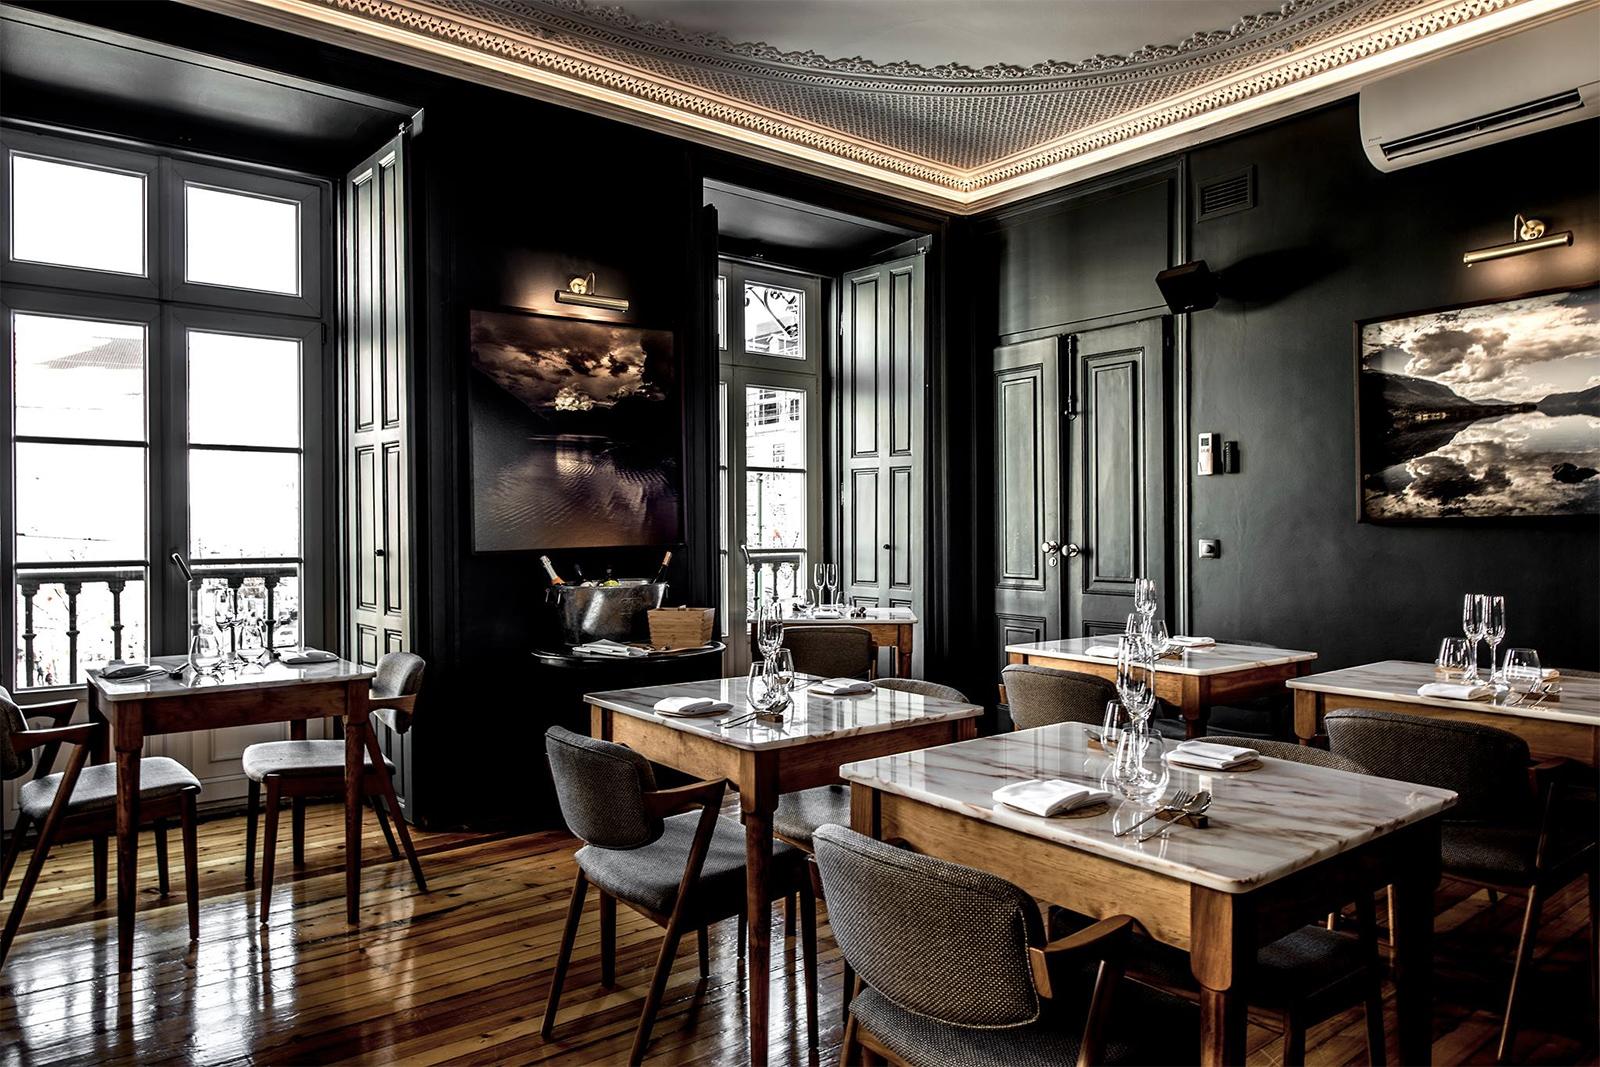 Taberna Fina restaurant in Lisbon